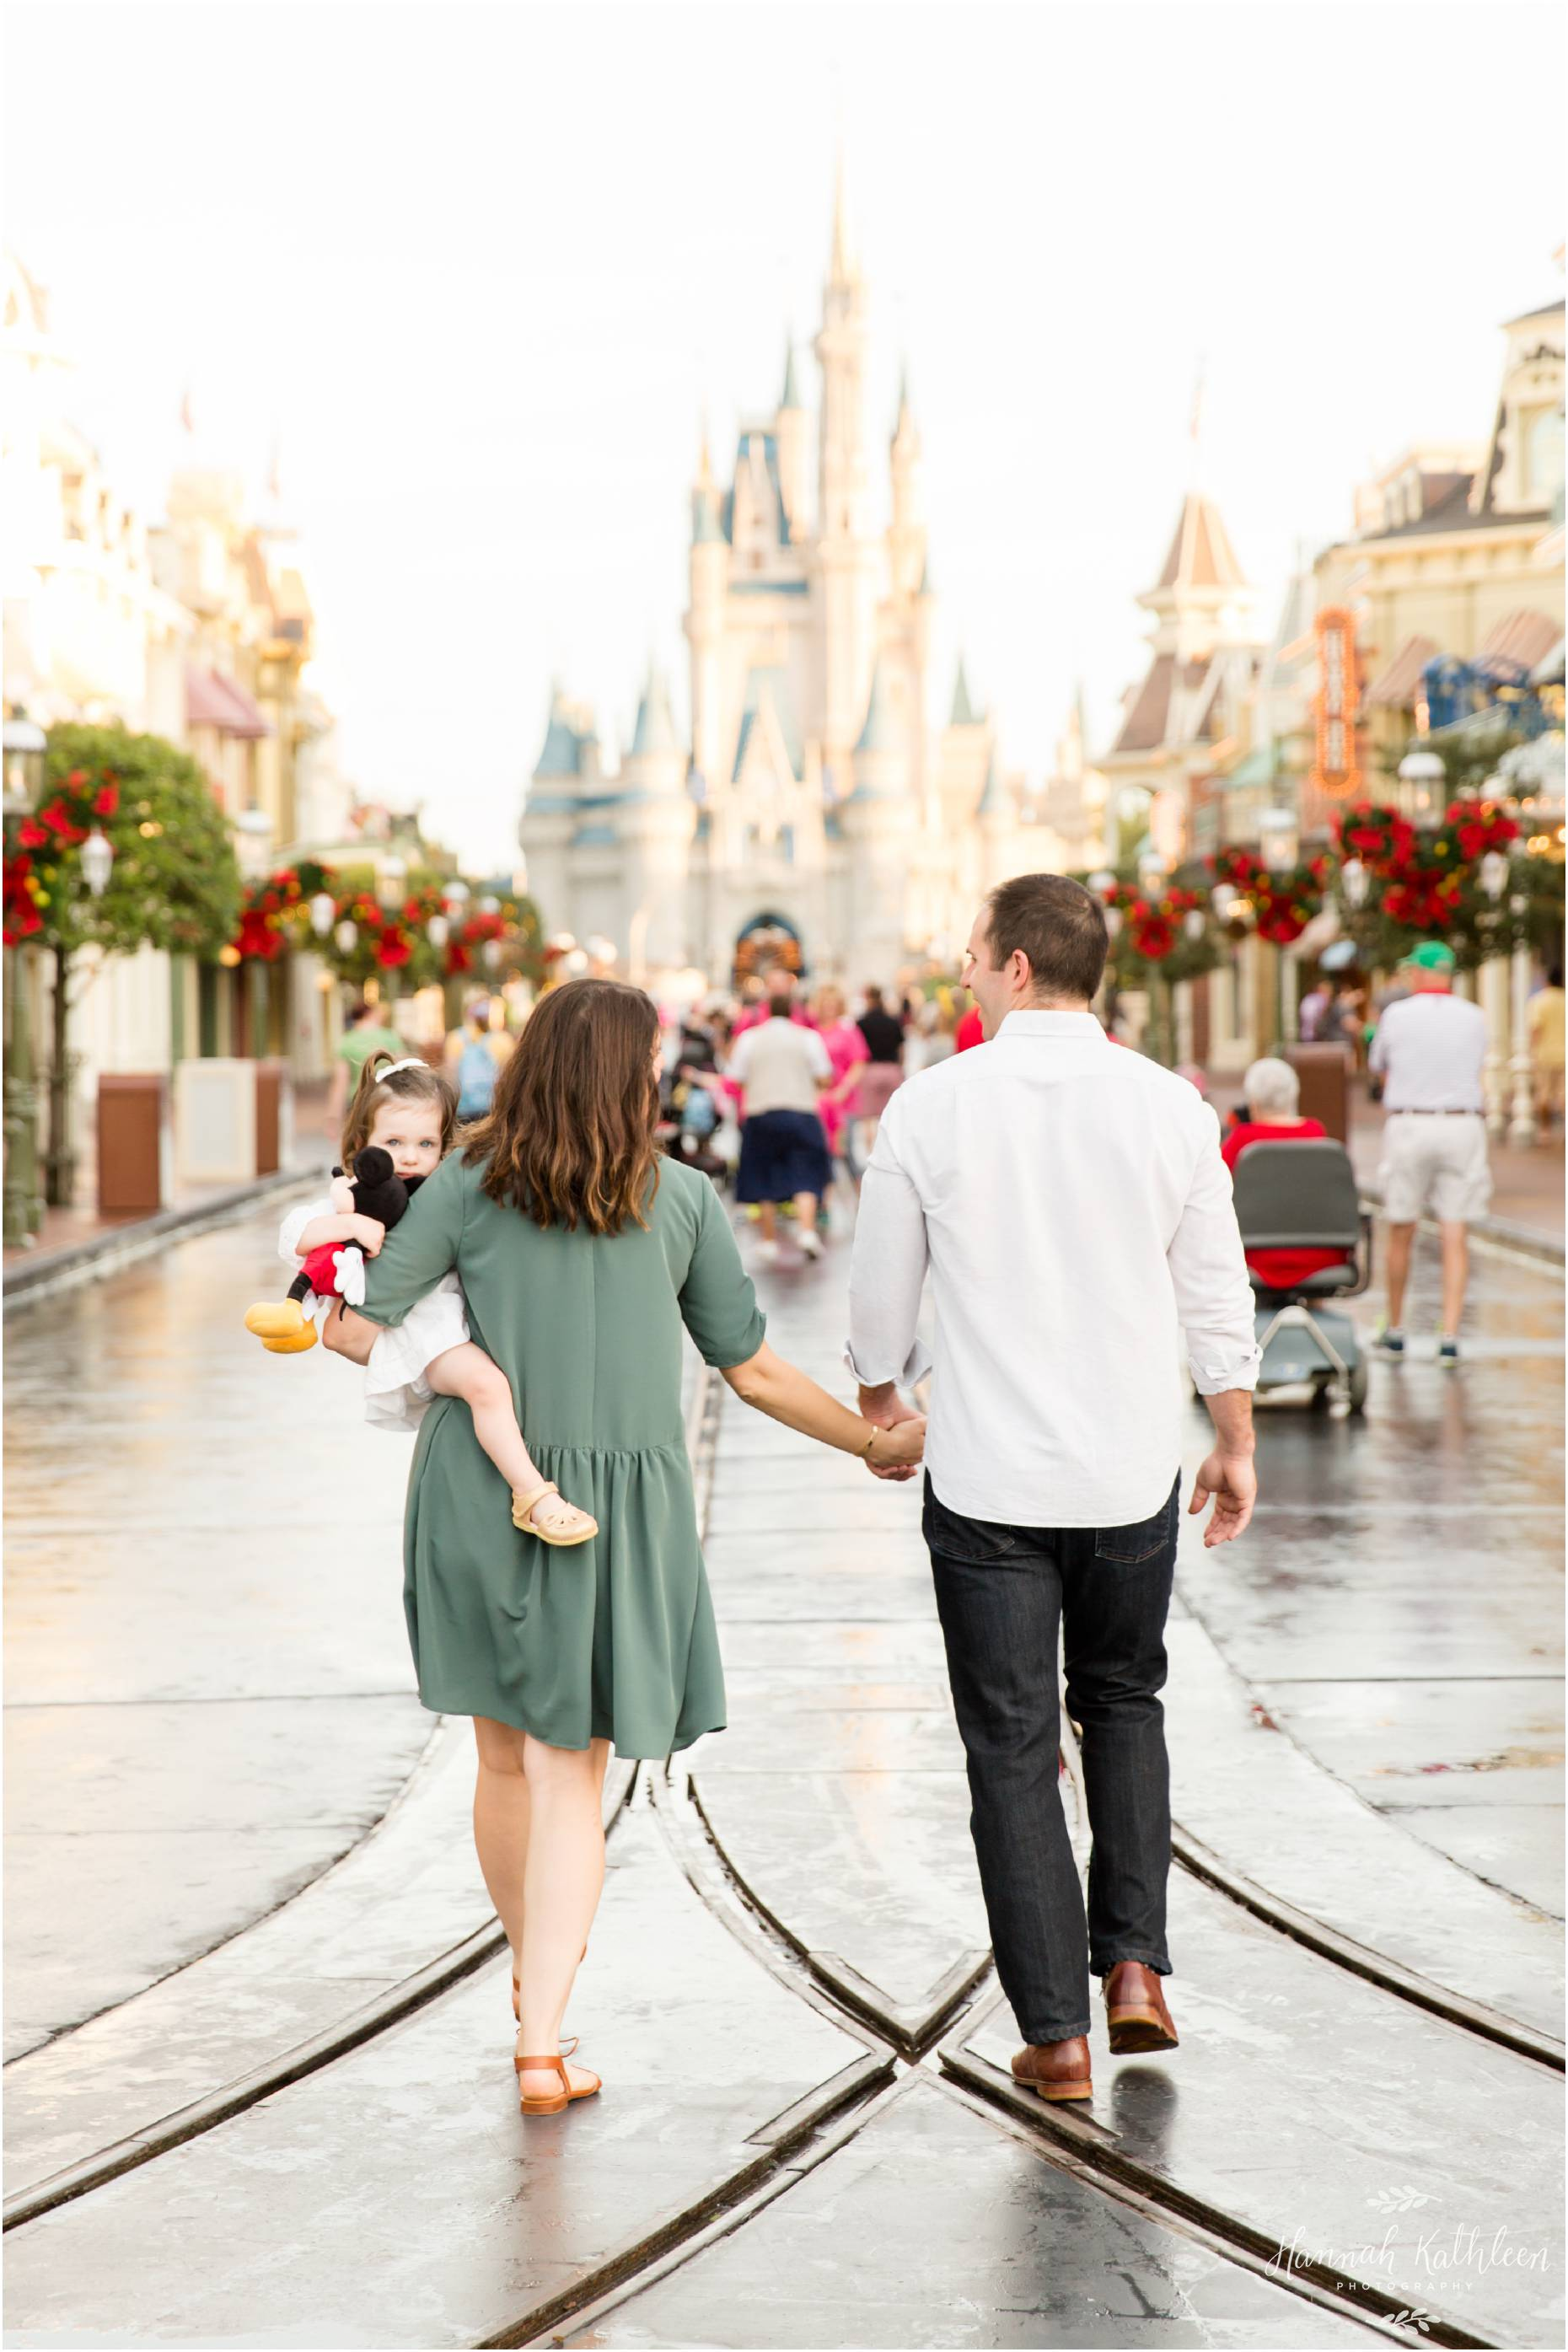 George_Magic_Kingdom_Disney_World_Family_Photography